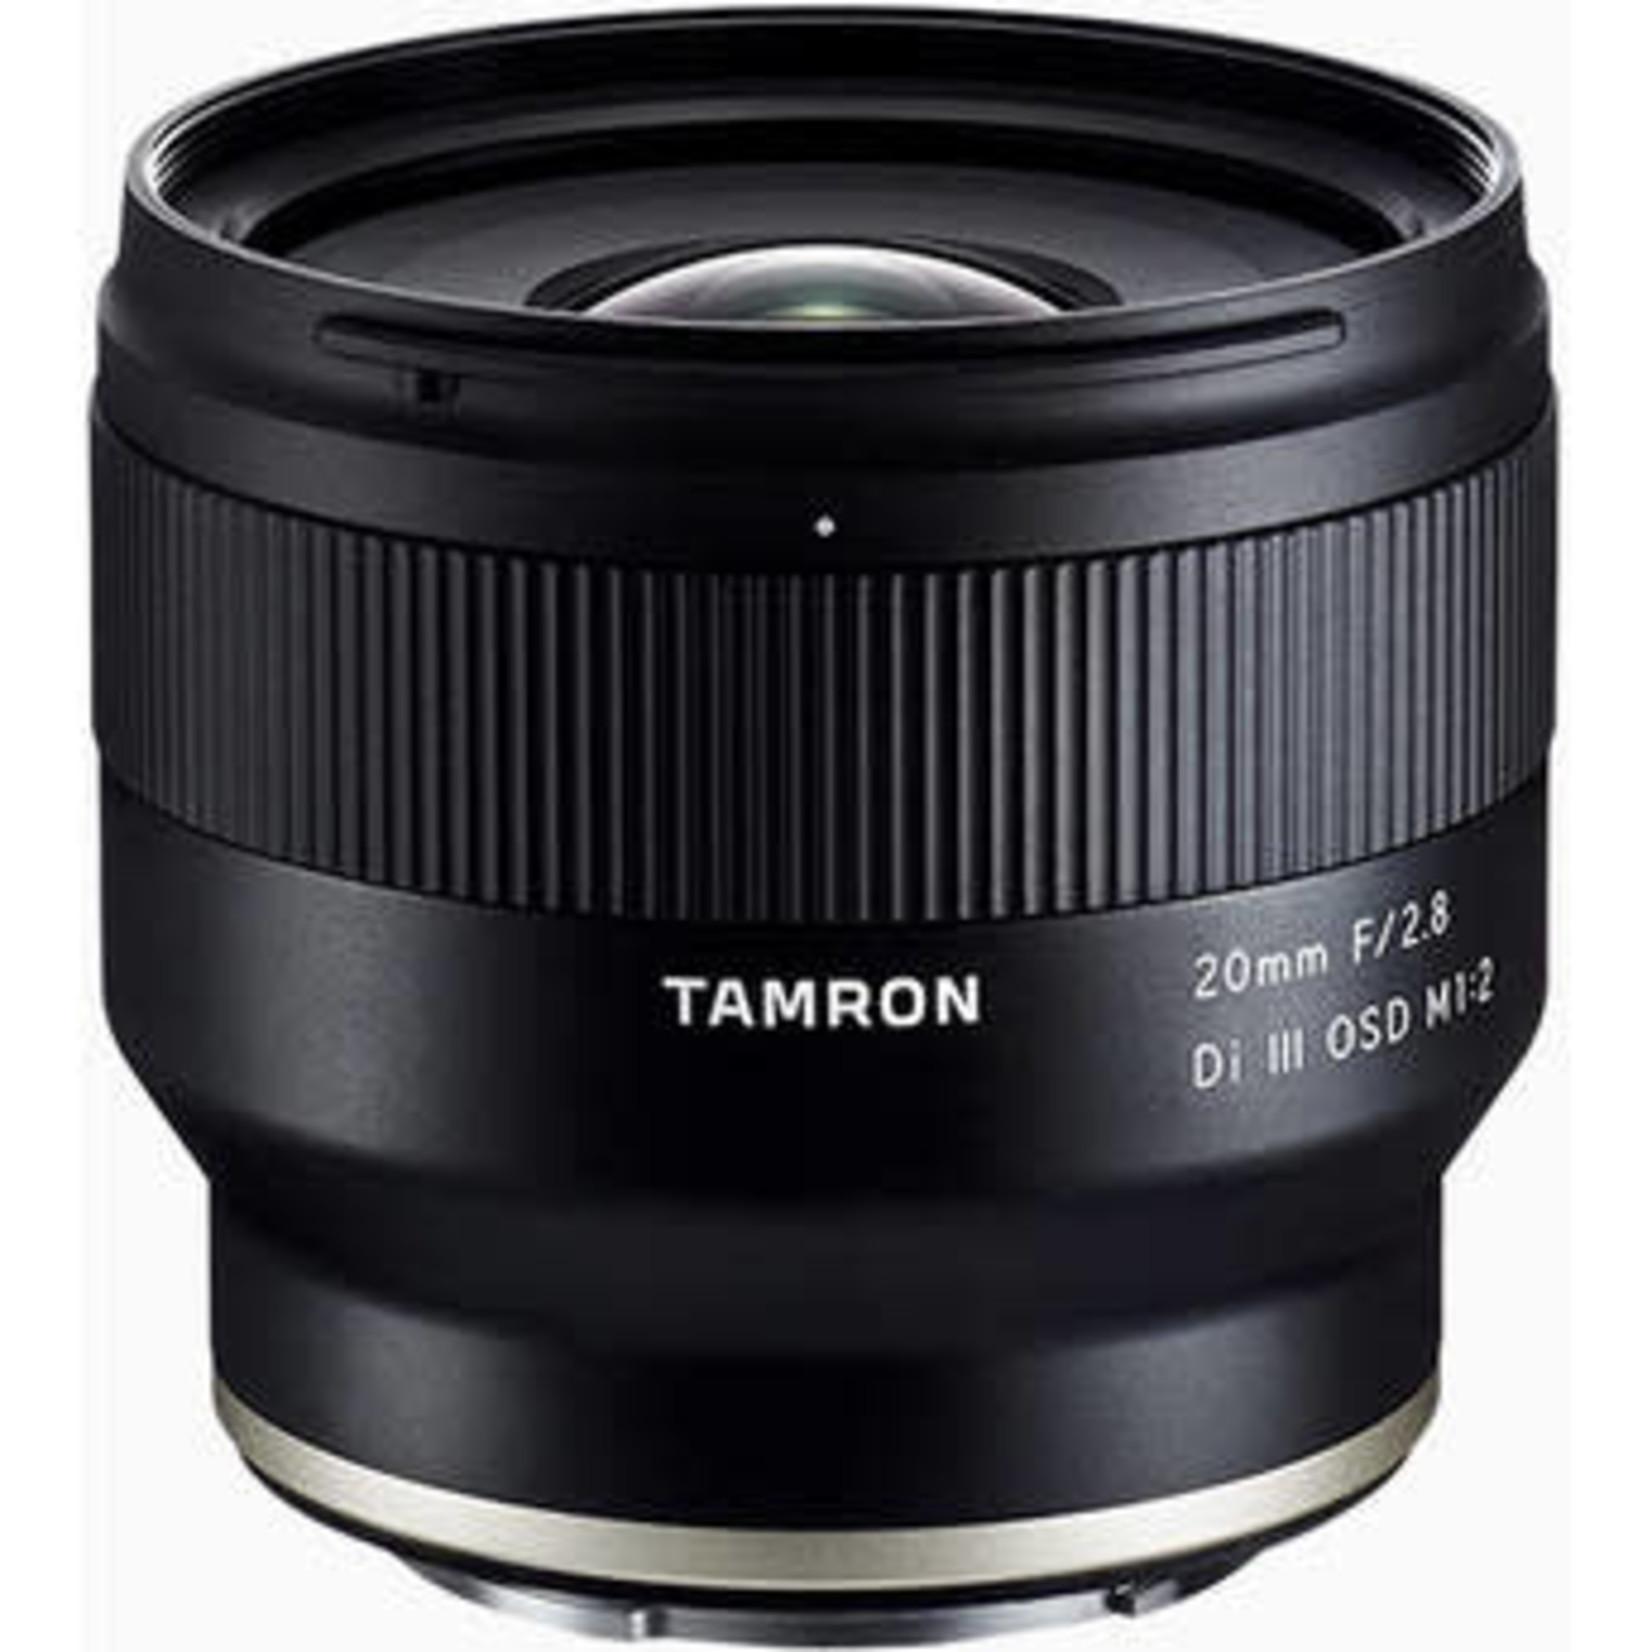 Tamron Tamron 20mm f/2.8 Di III OSD M 1:2 Lens for Sony E